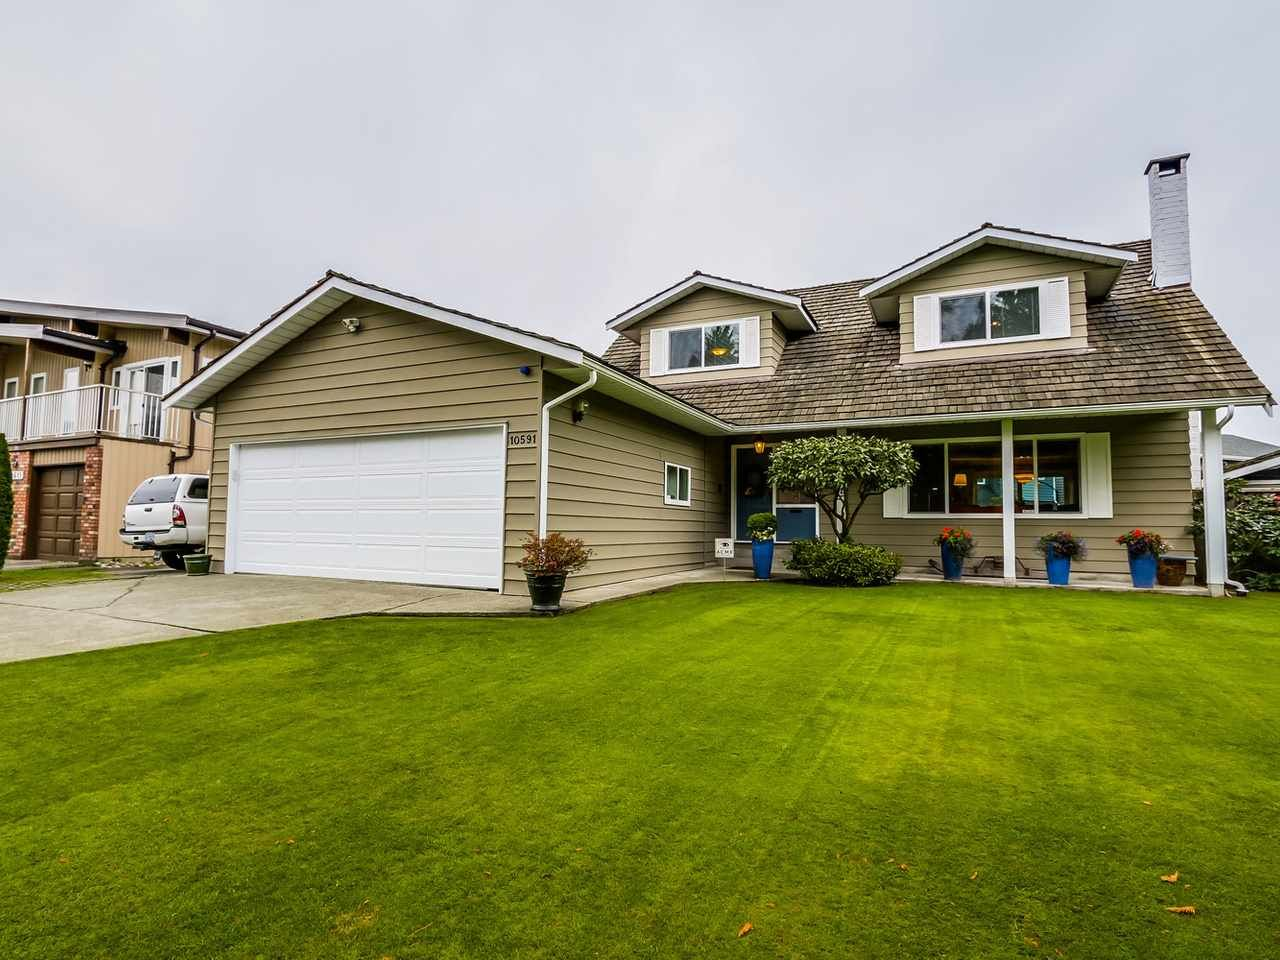 Main Photo: 10591 TREPASSEY DRIVE: Steveston North Home for sale ()  : MLS®# R2012787